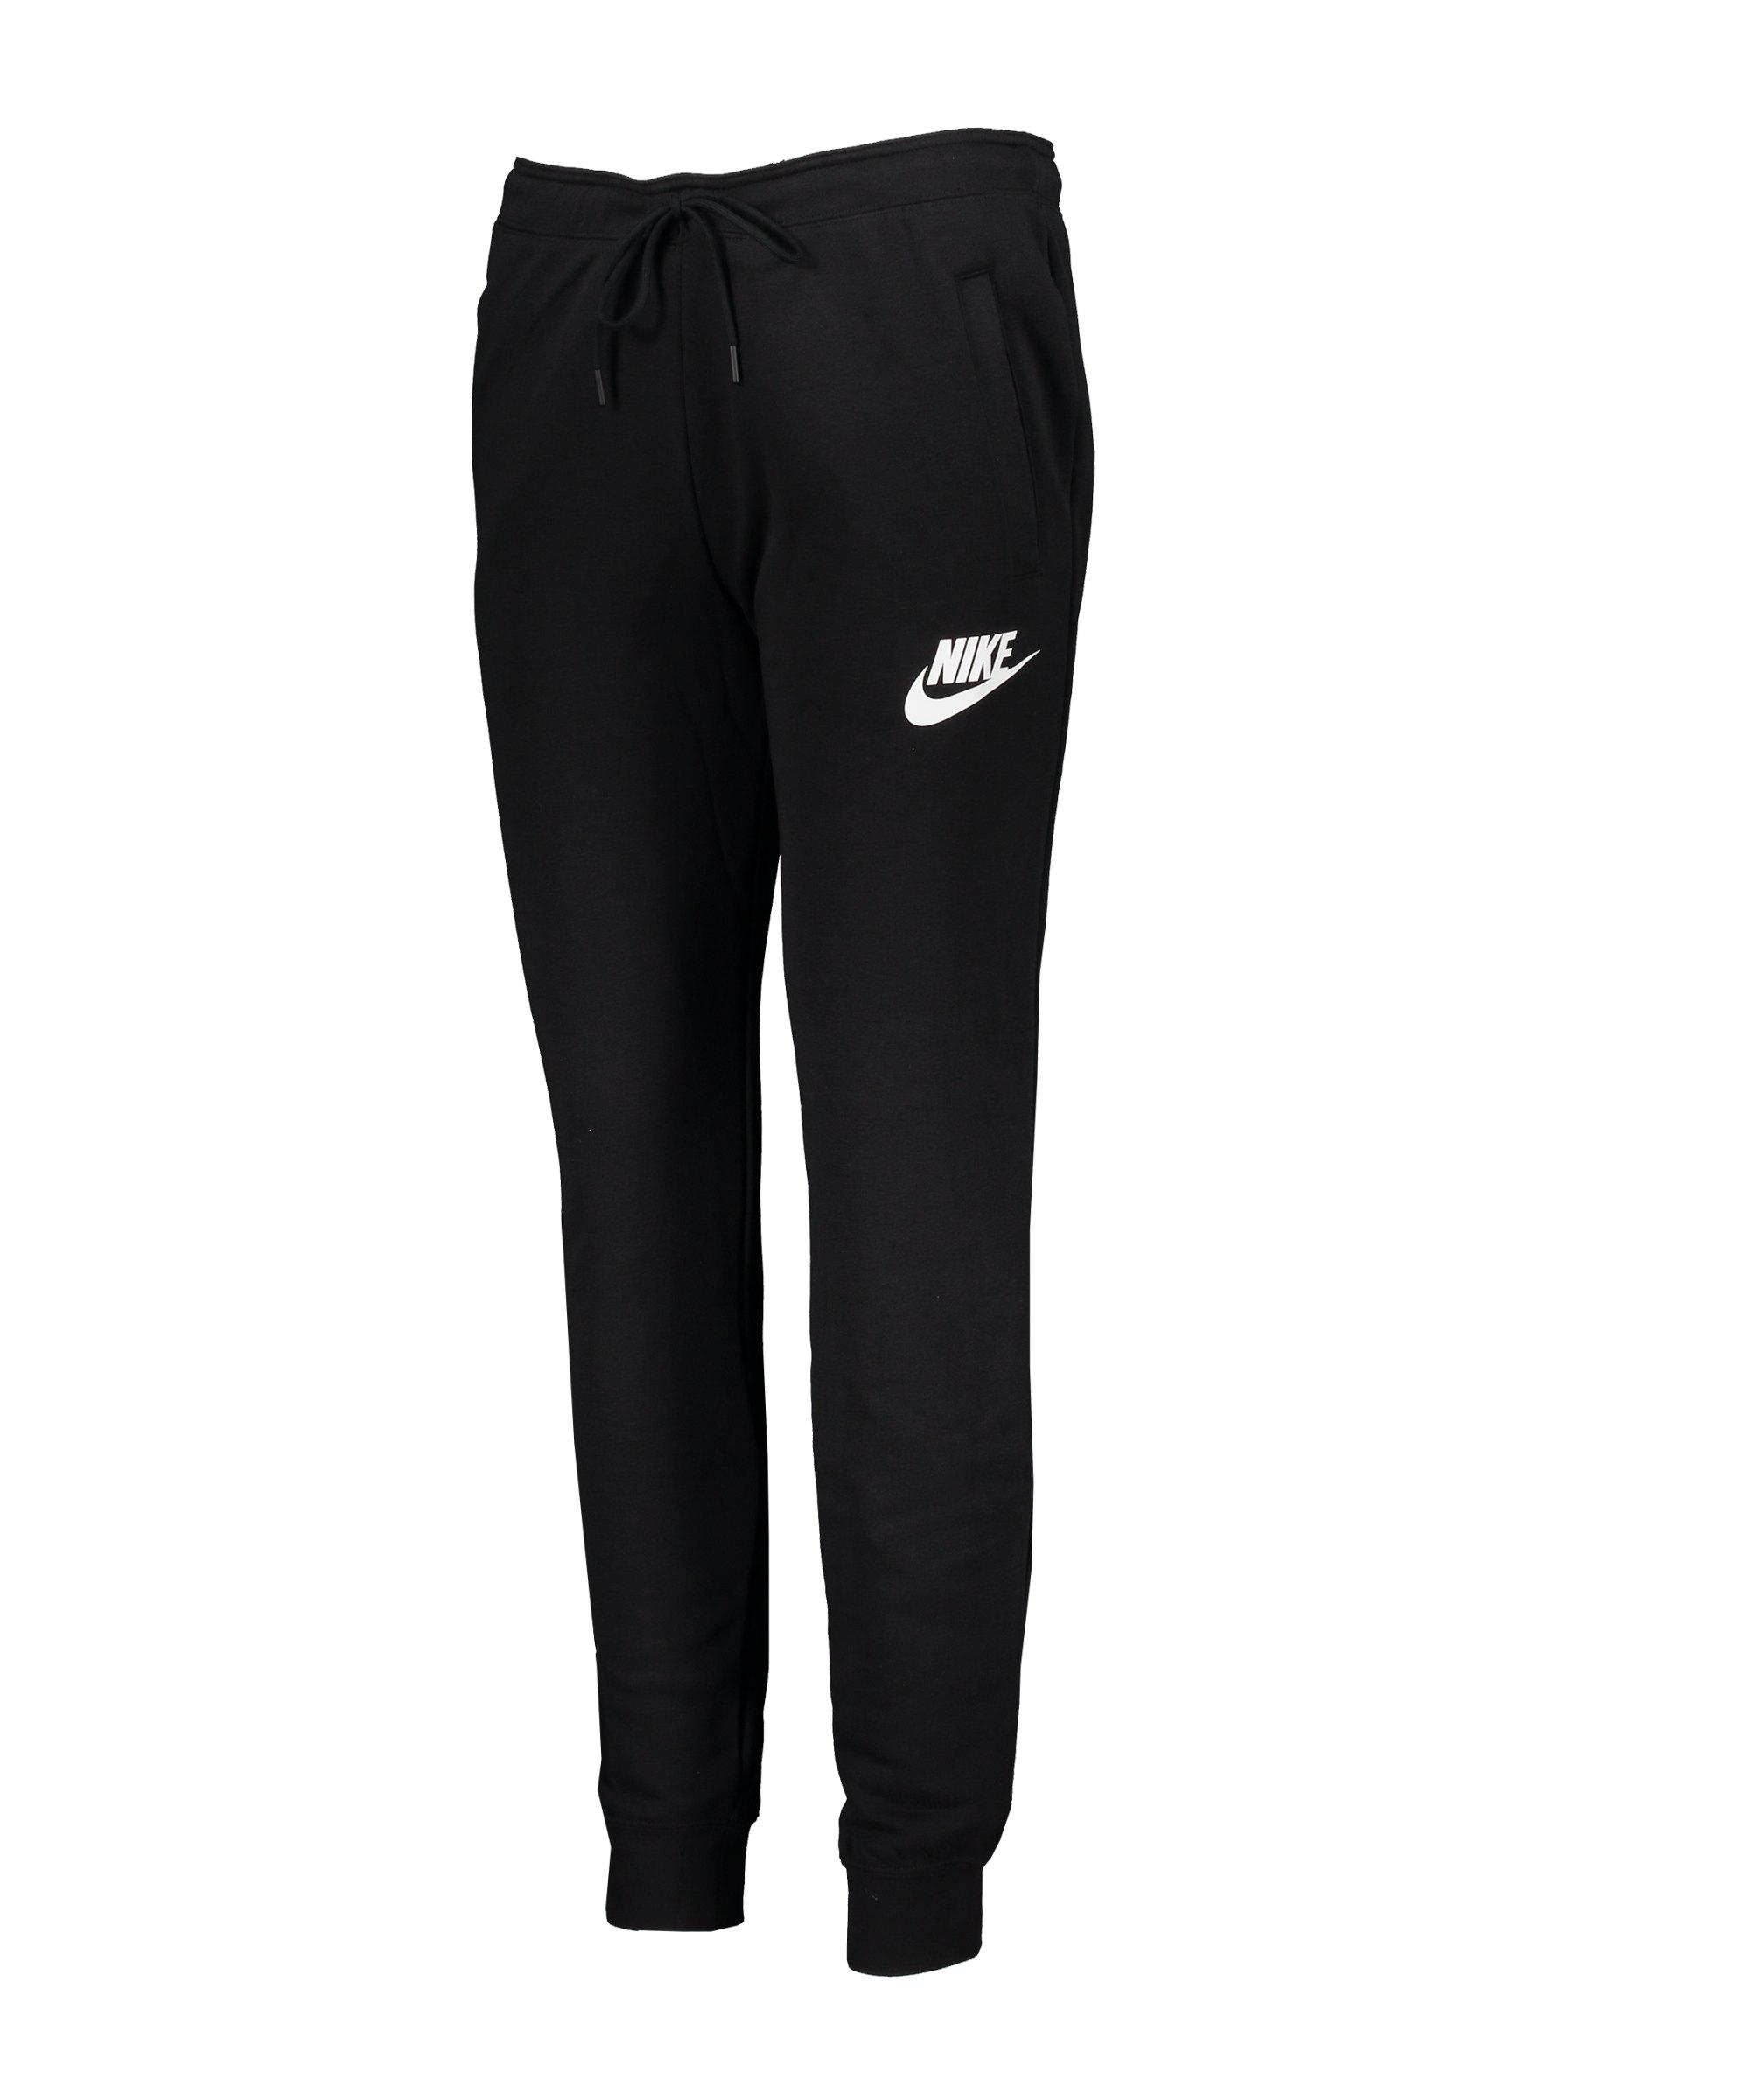 Nike Rally Jogginghose Damen Schwarz F010 - schwarz